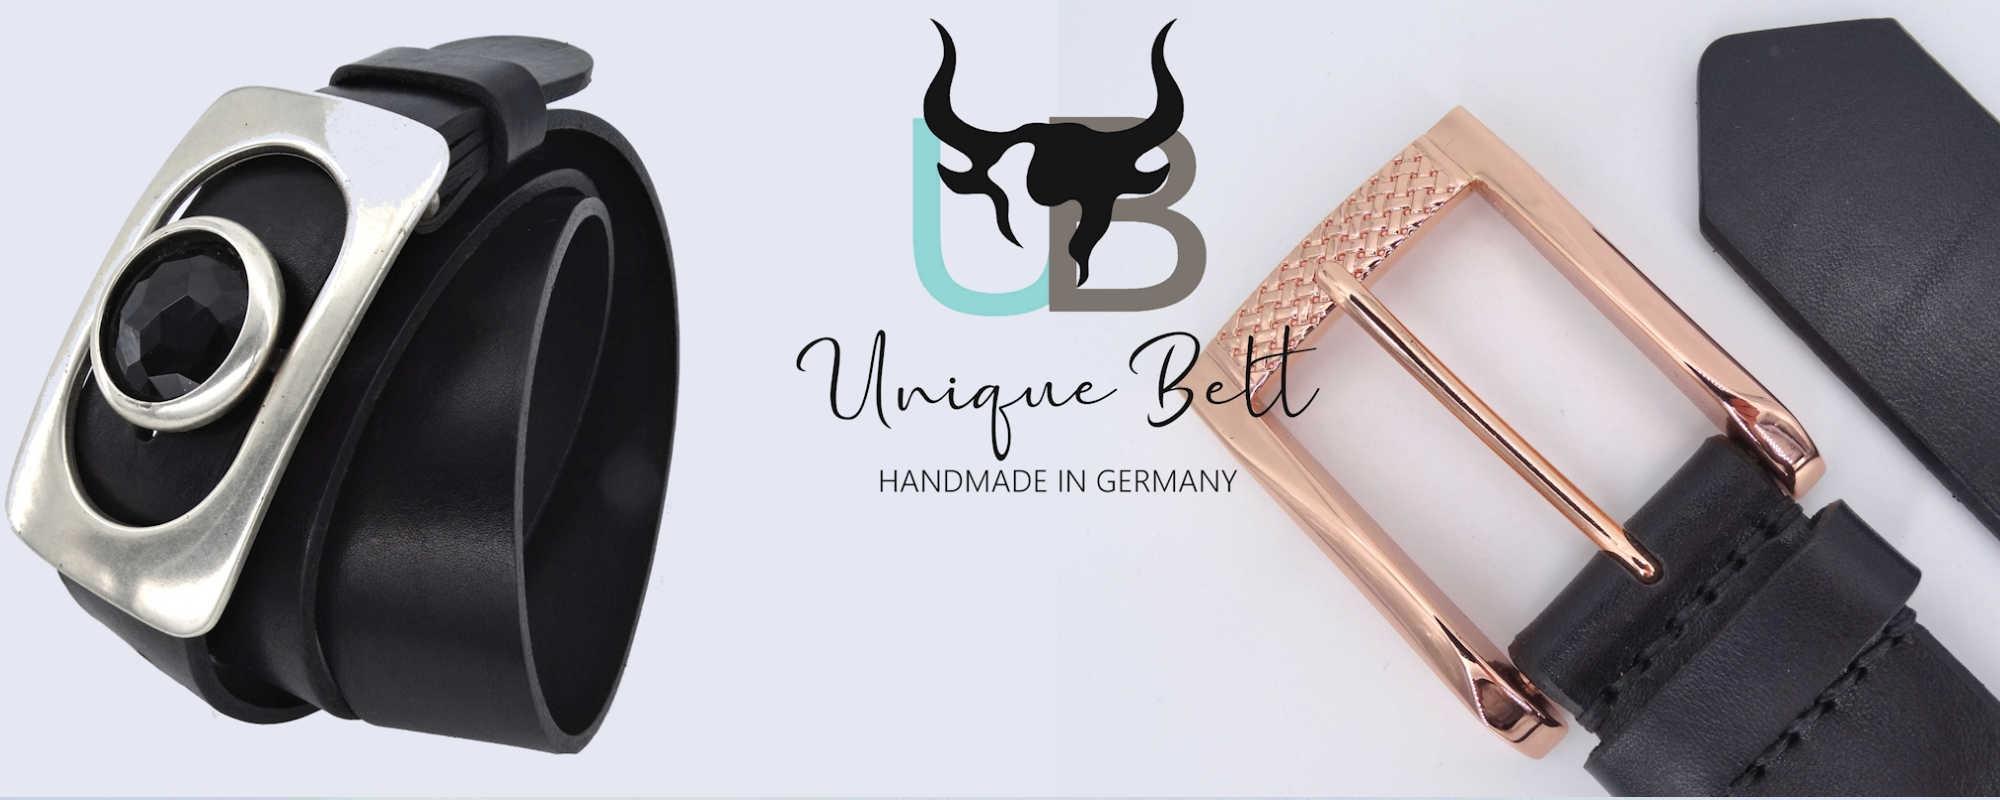 Unique belt ledergürtel